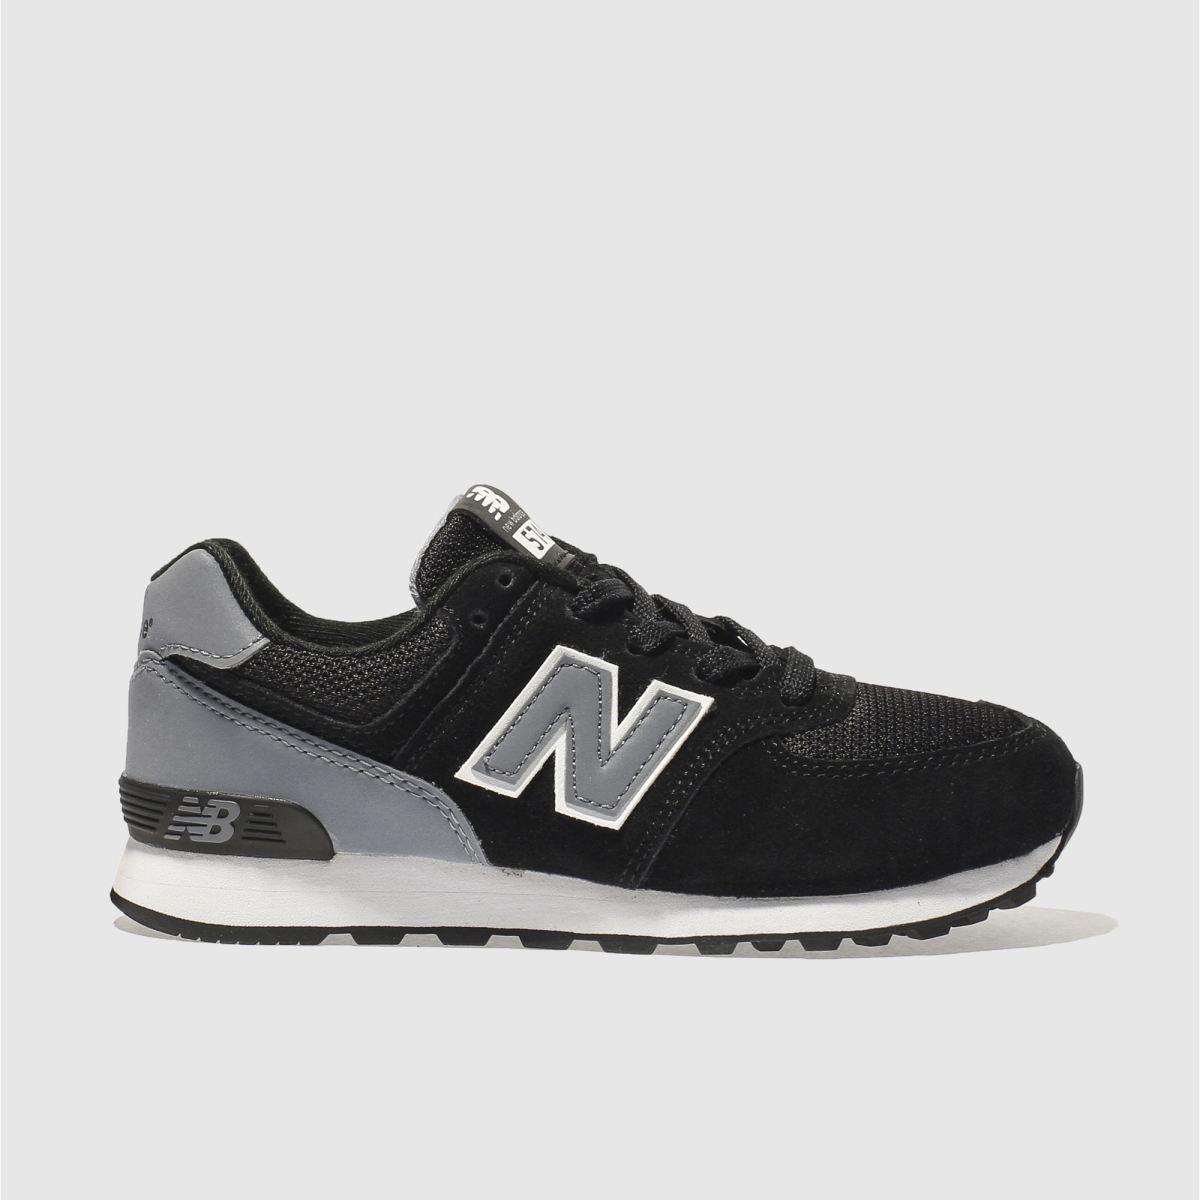 New Balance New Balance Black & Grey 574 Junior Trainers